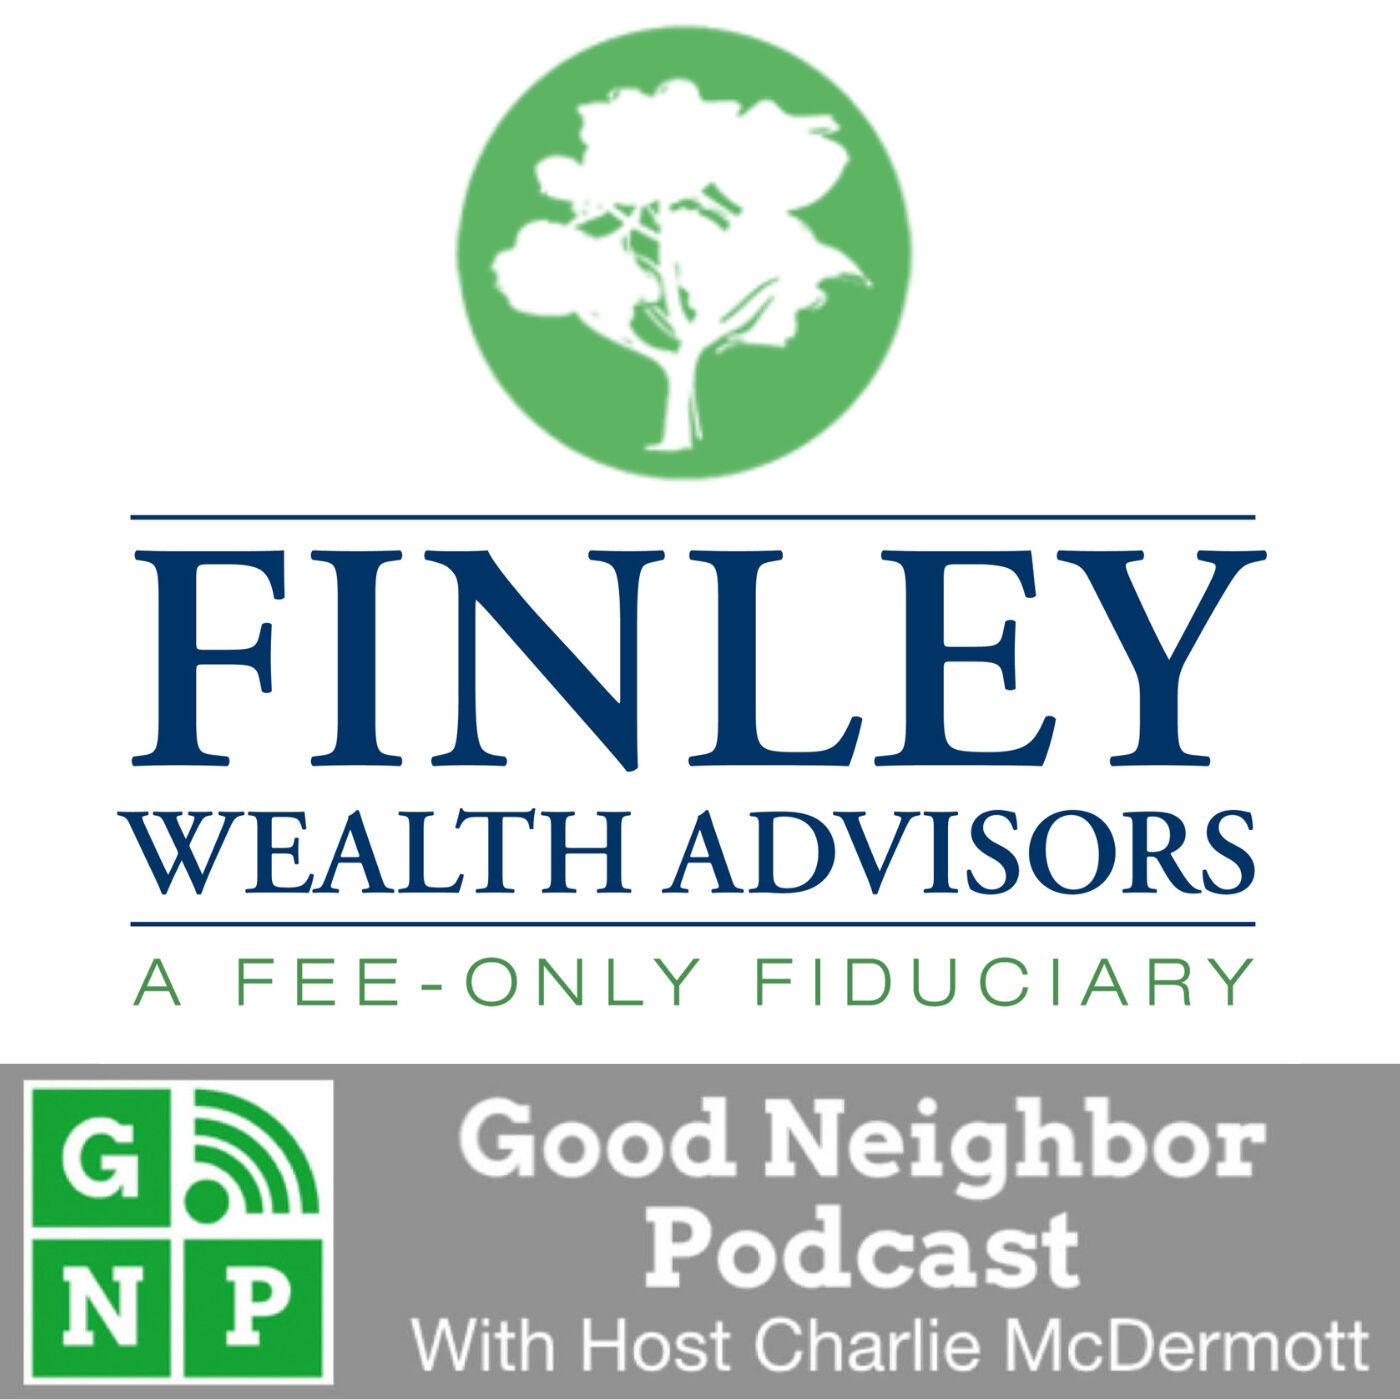 EP #529: Finley Wealth Advisors with Doug Finley